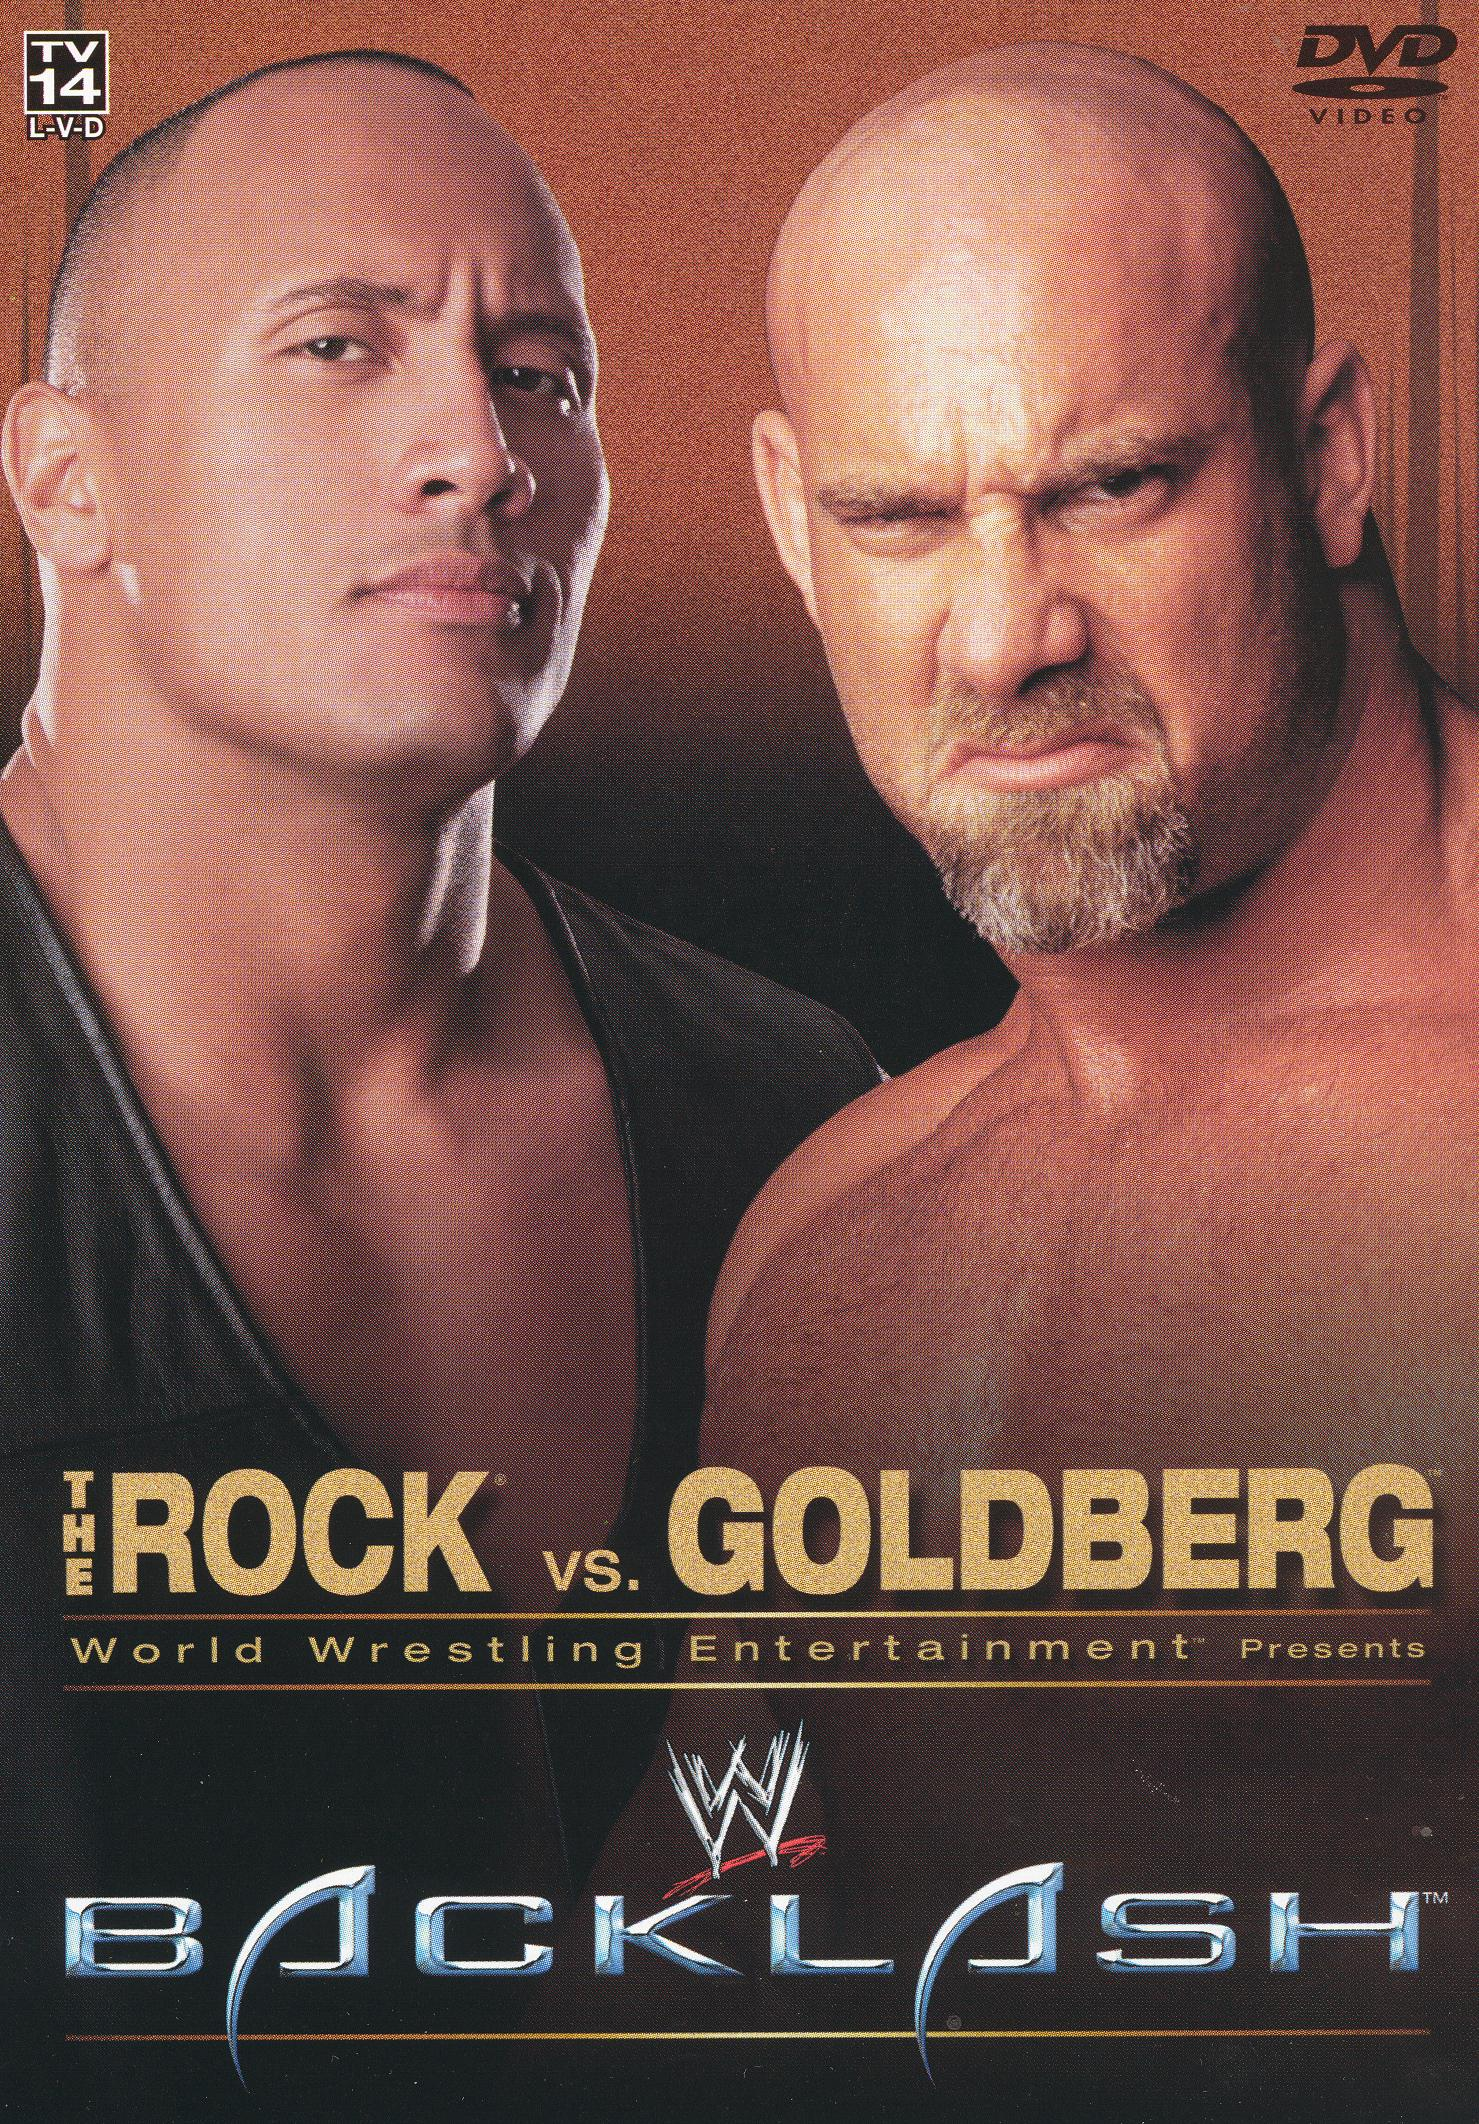 WWE: Backlash - The Rock vs. Goldberg